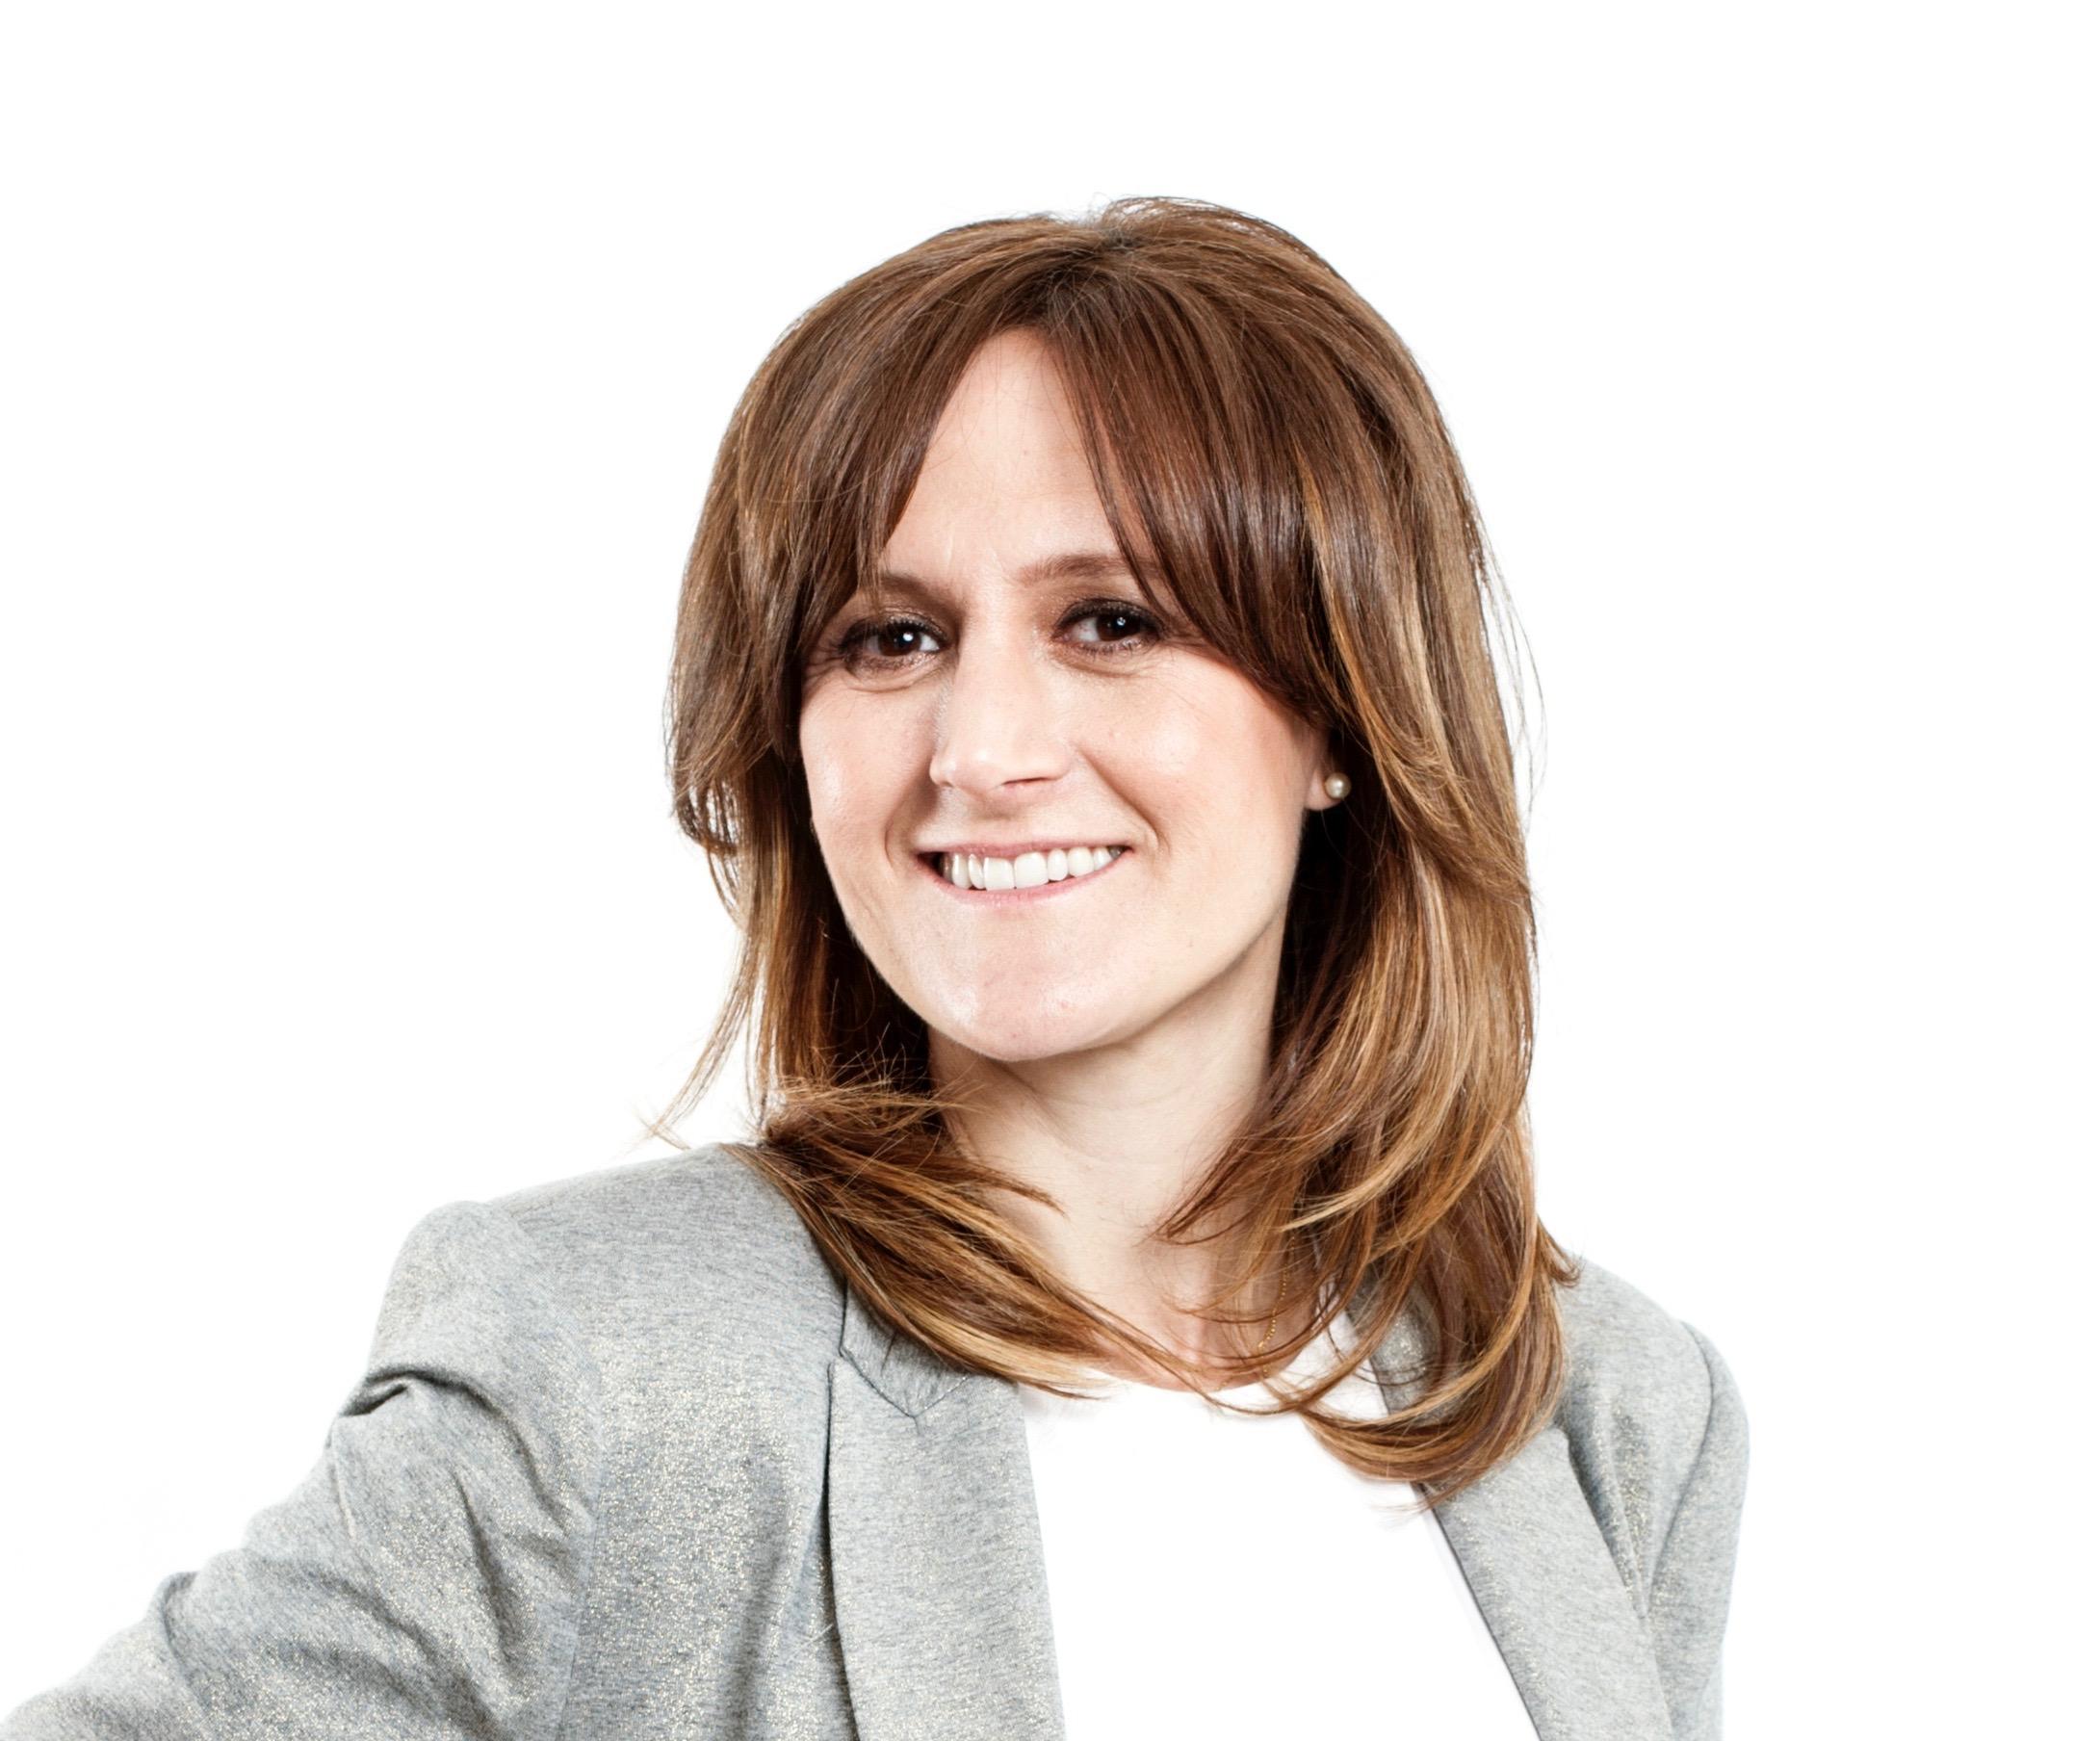 Laura Suárez Samper